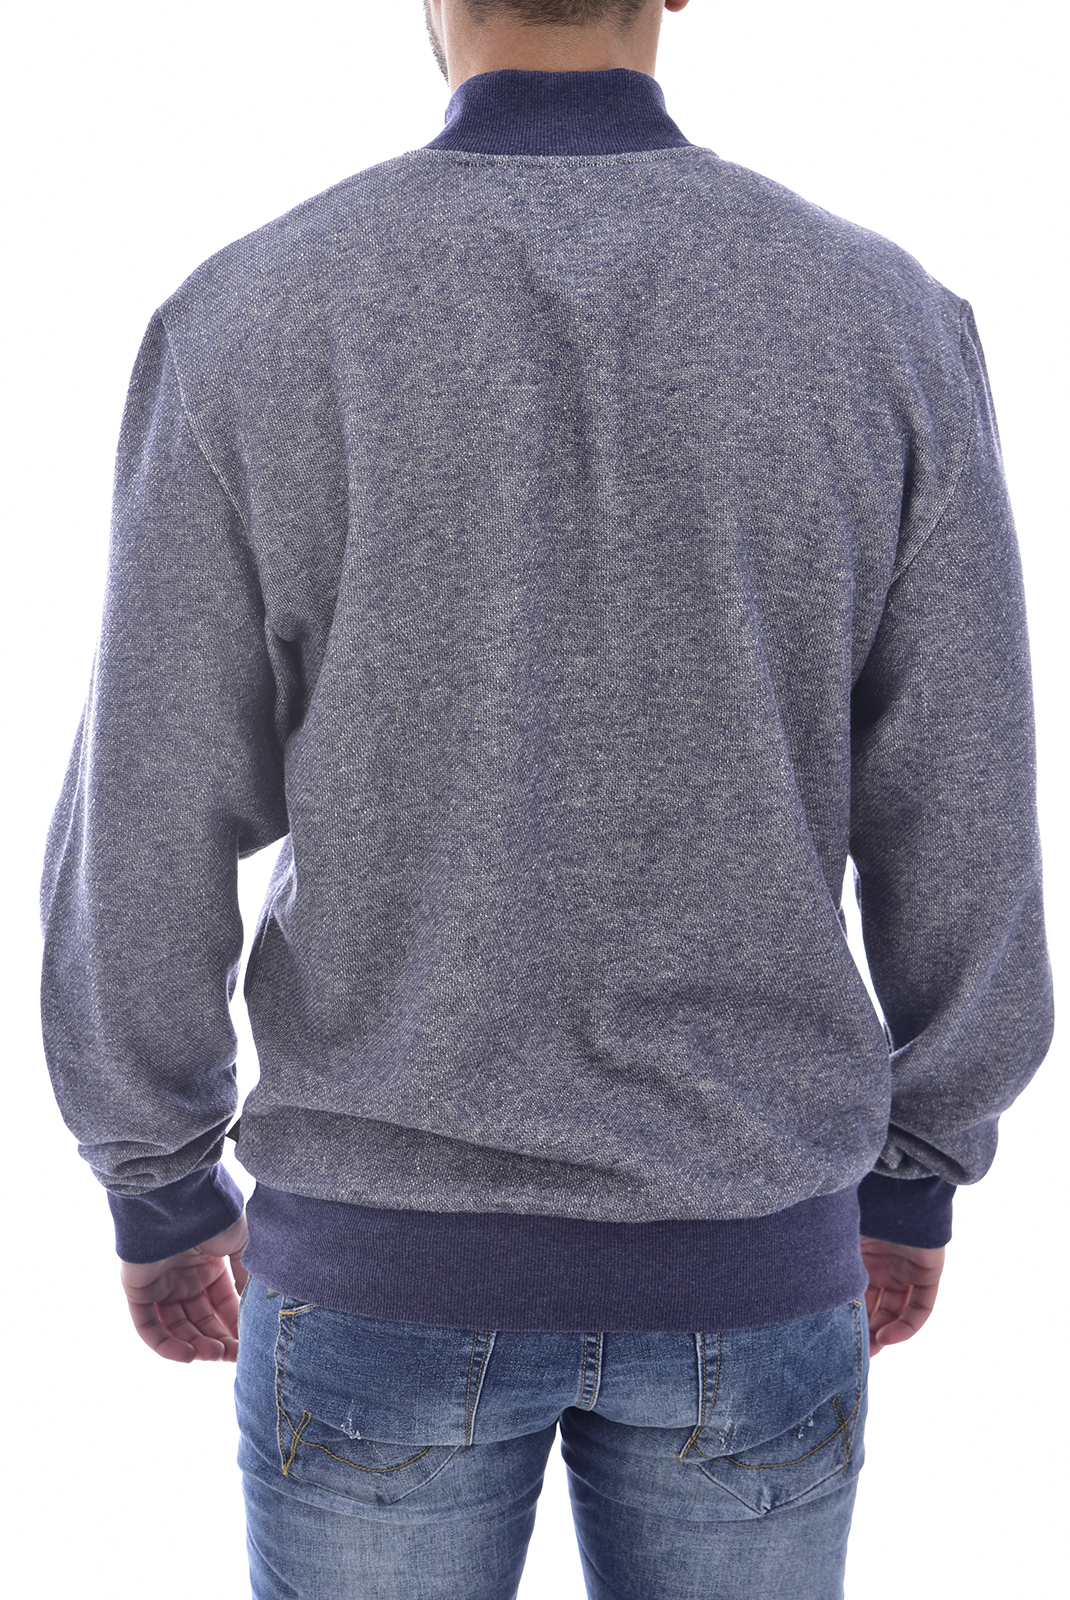 Sweatshirts  Emporio armani 111704 8A575 52635 BLU MELANGE